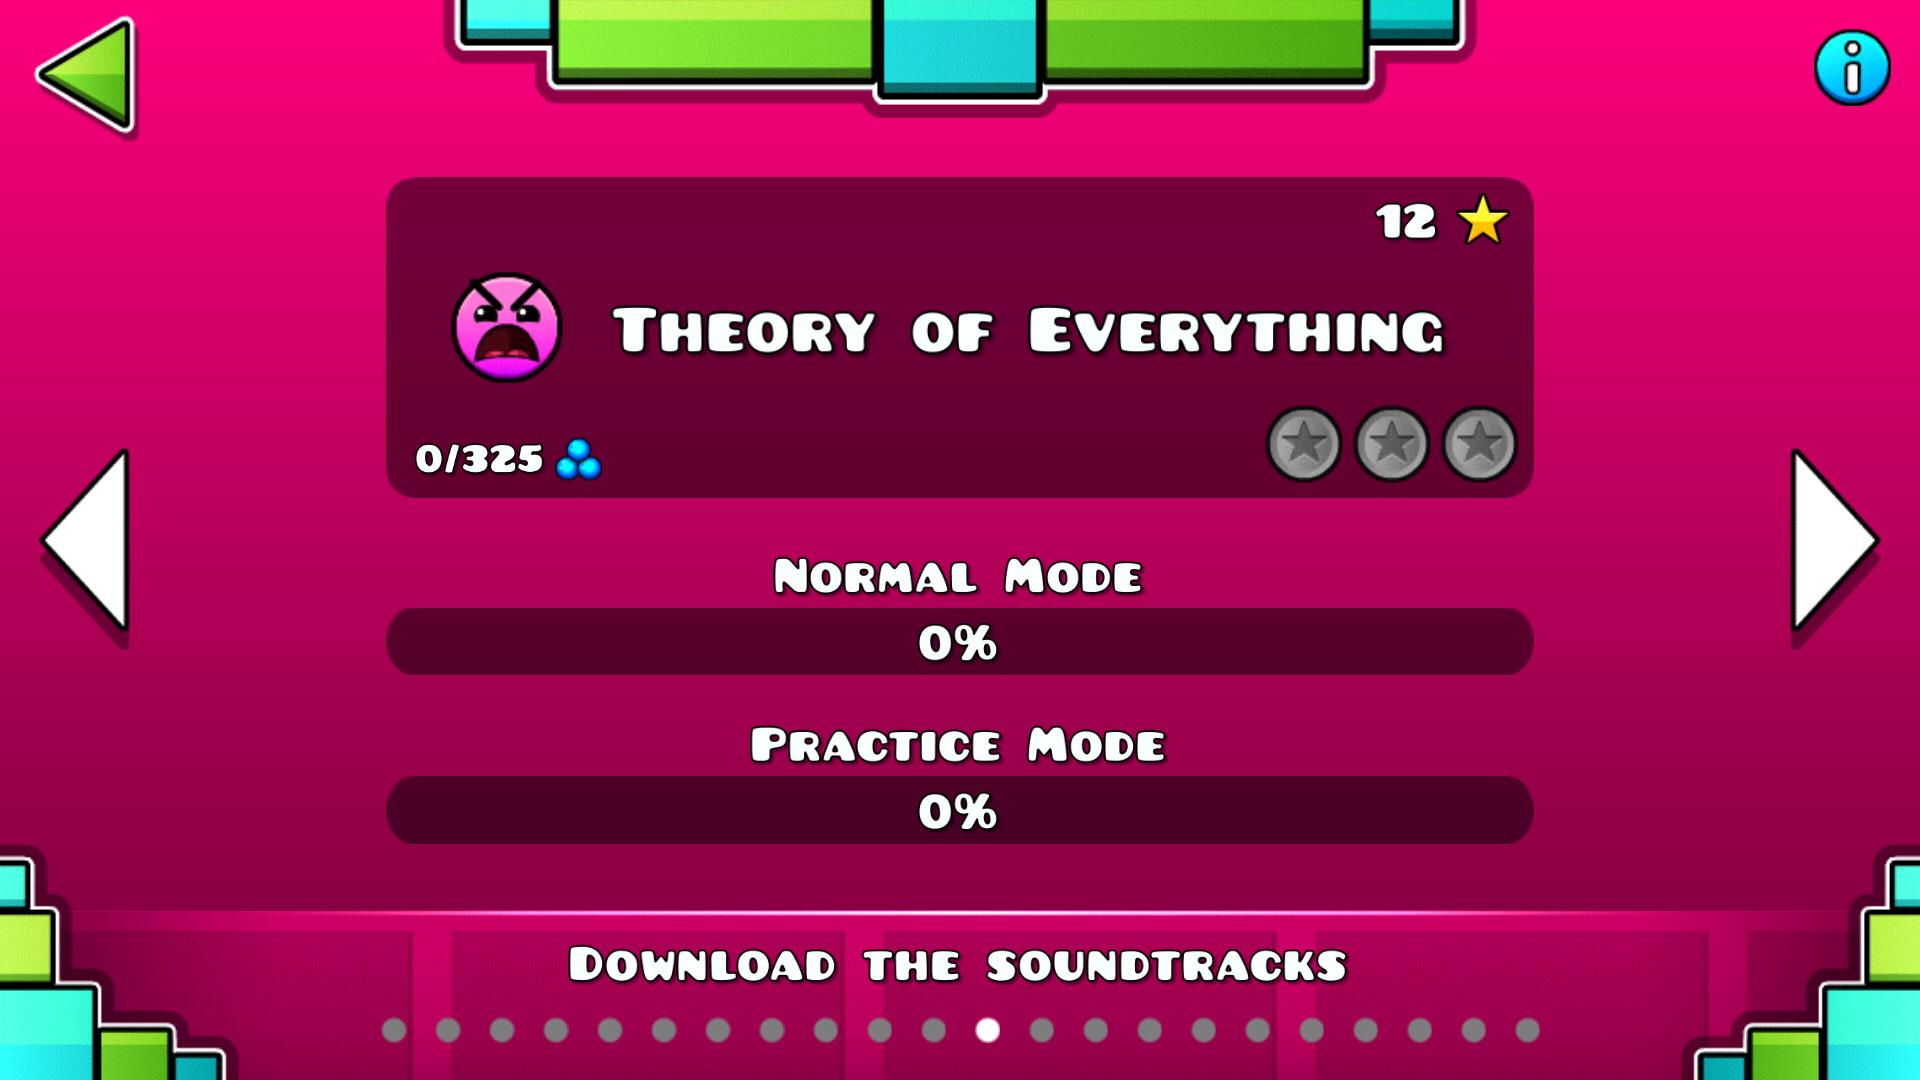 TheoryOfEverythingMenu.png